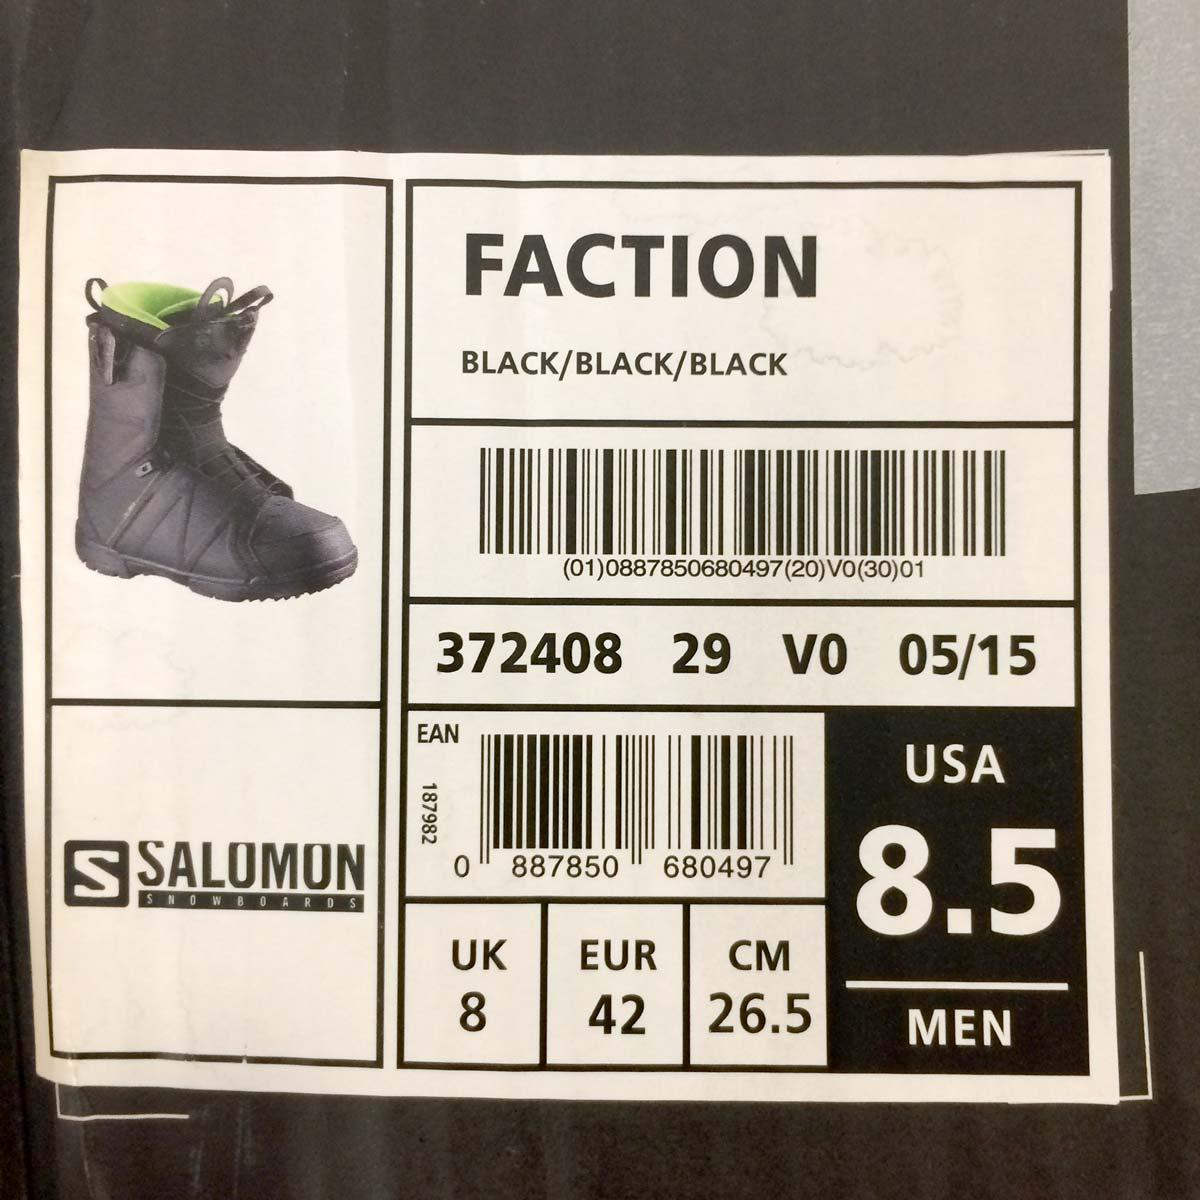 4b1ca513 Salomon Faction Snowboard Boots - UK 8 - Ex Demo Never Worn - 10/10